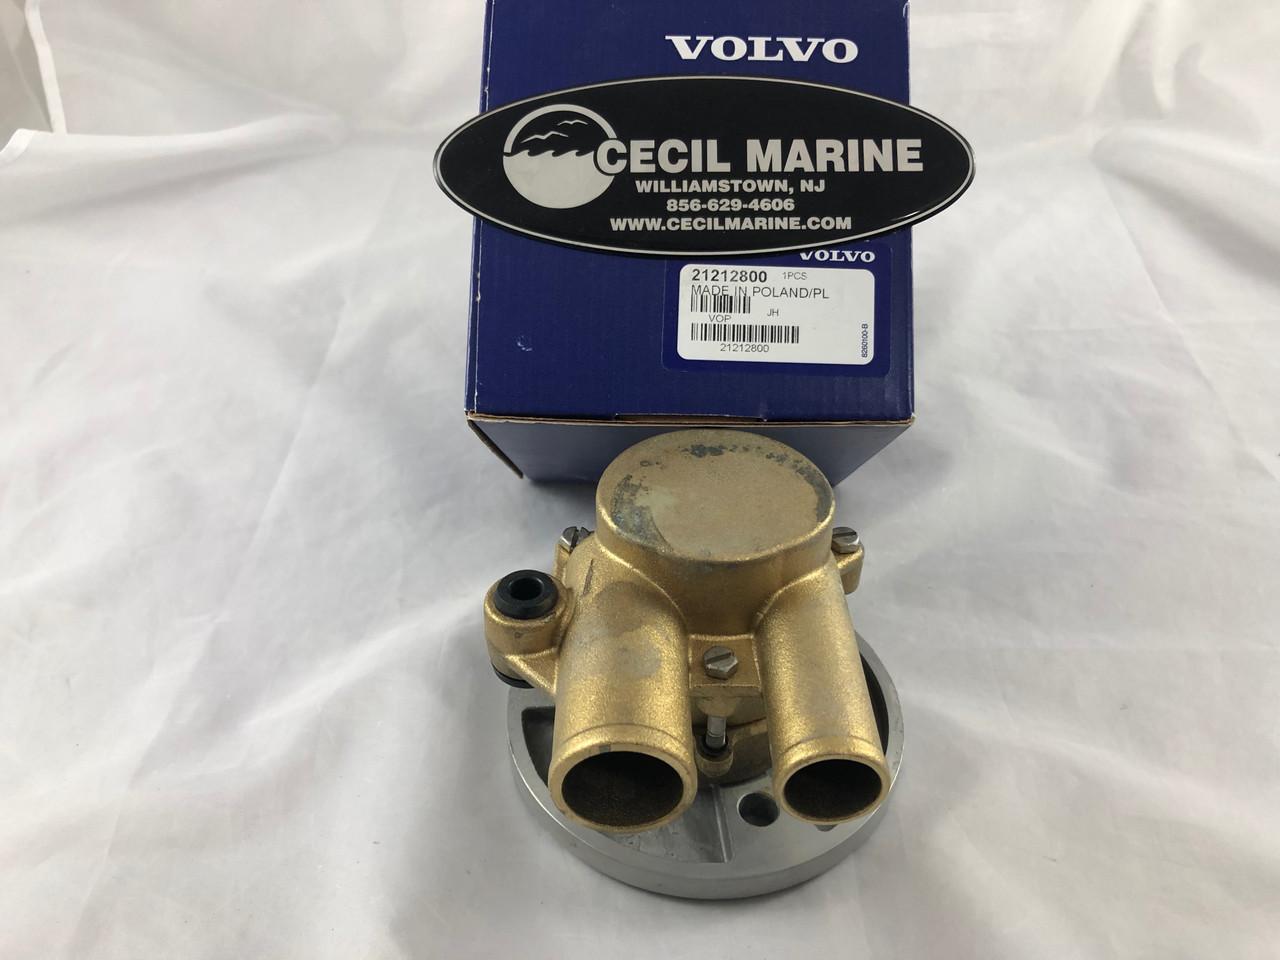 medium resolution of  329 95 genuine volvo sea water pump 21212800 in stock ready to ship